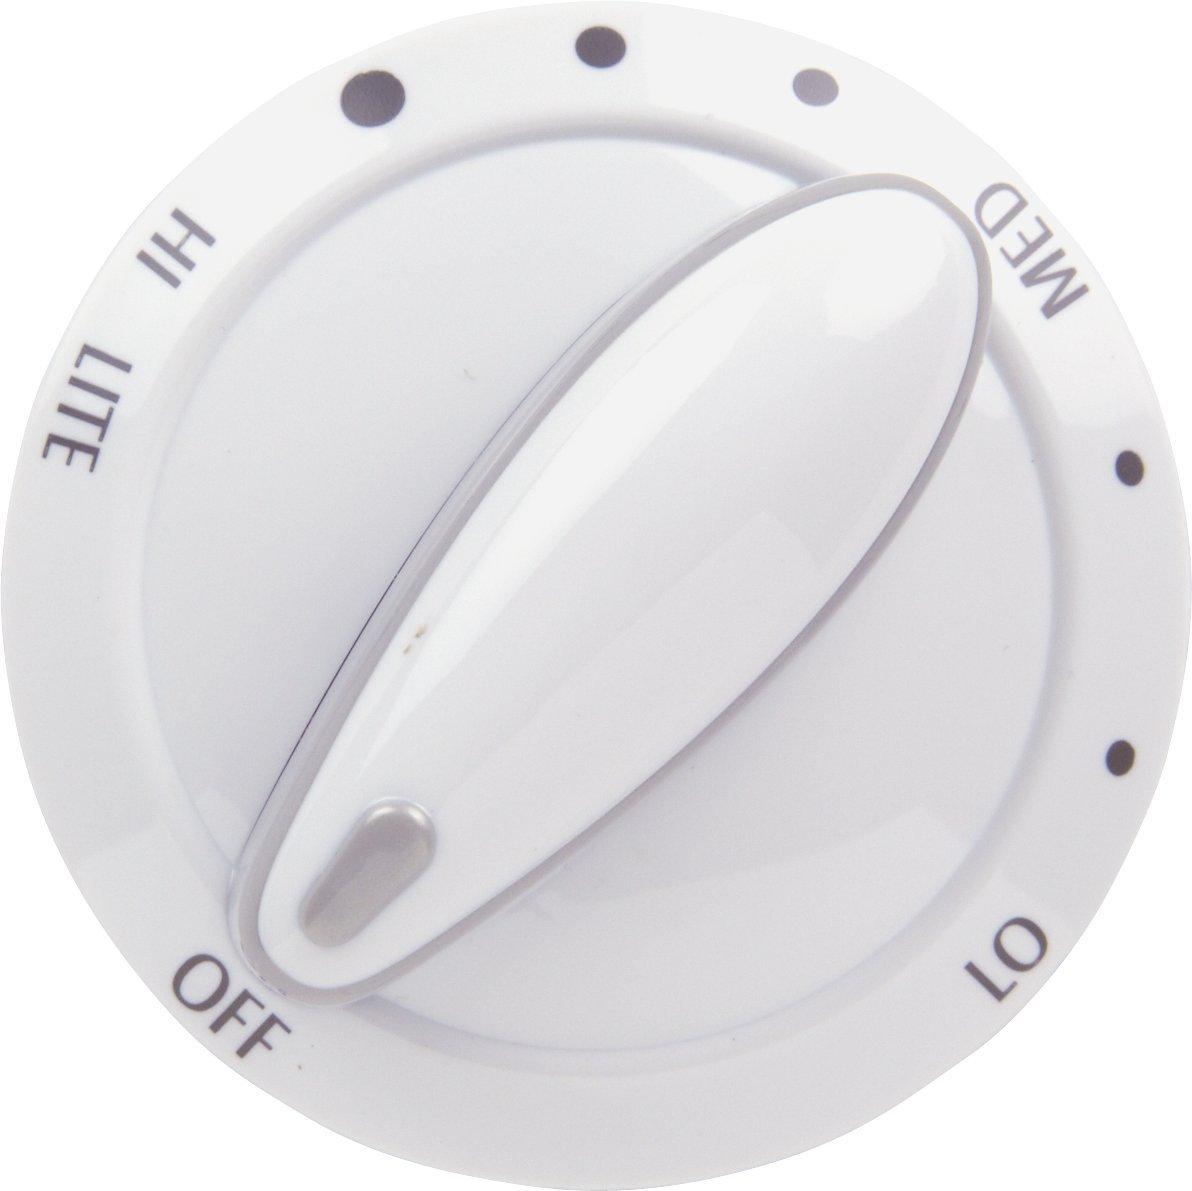 Whirlpool 74011276 Control Knob Burner, Top